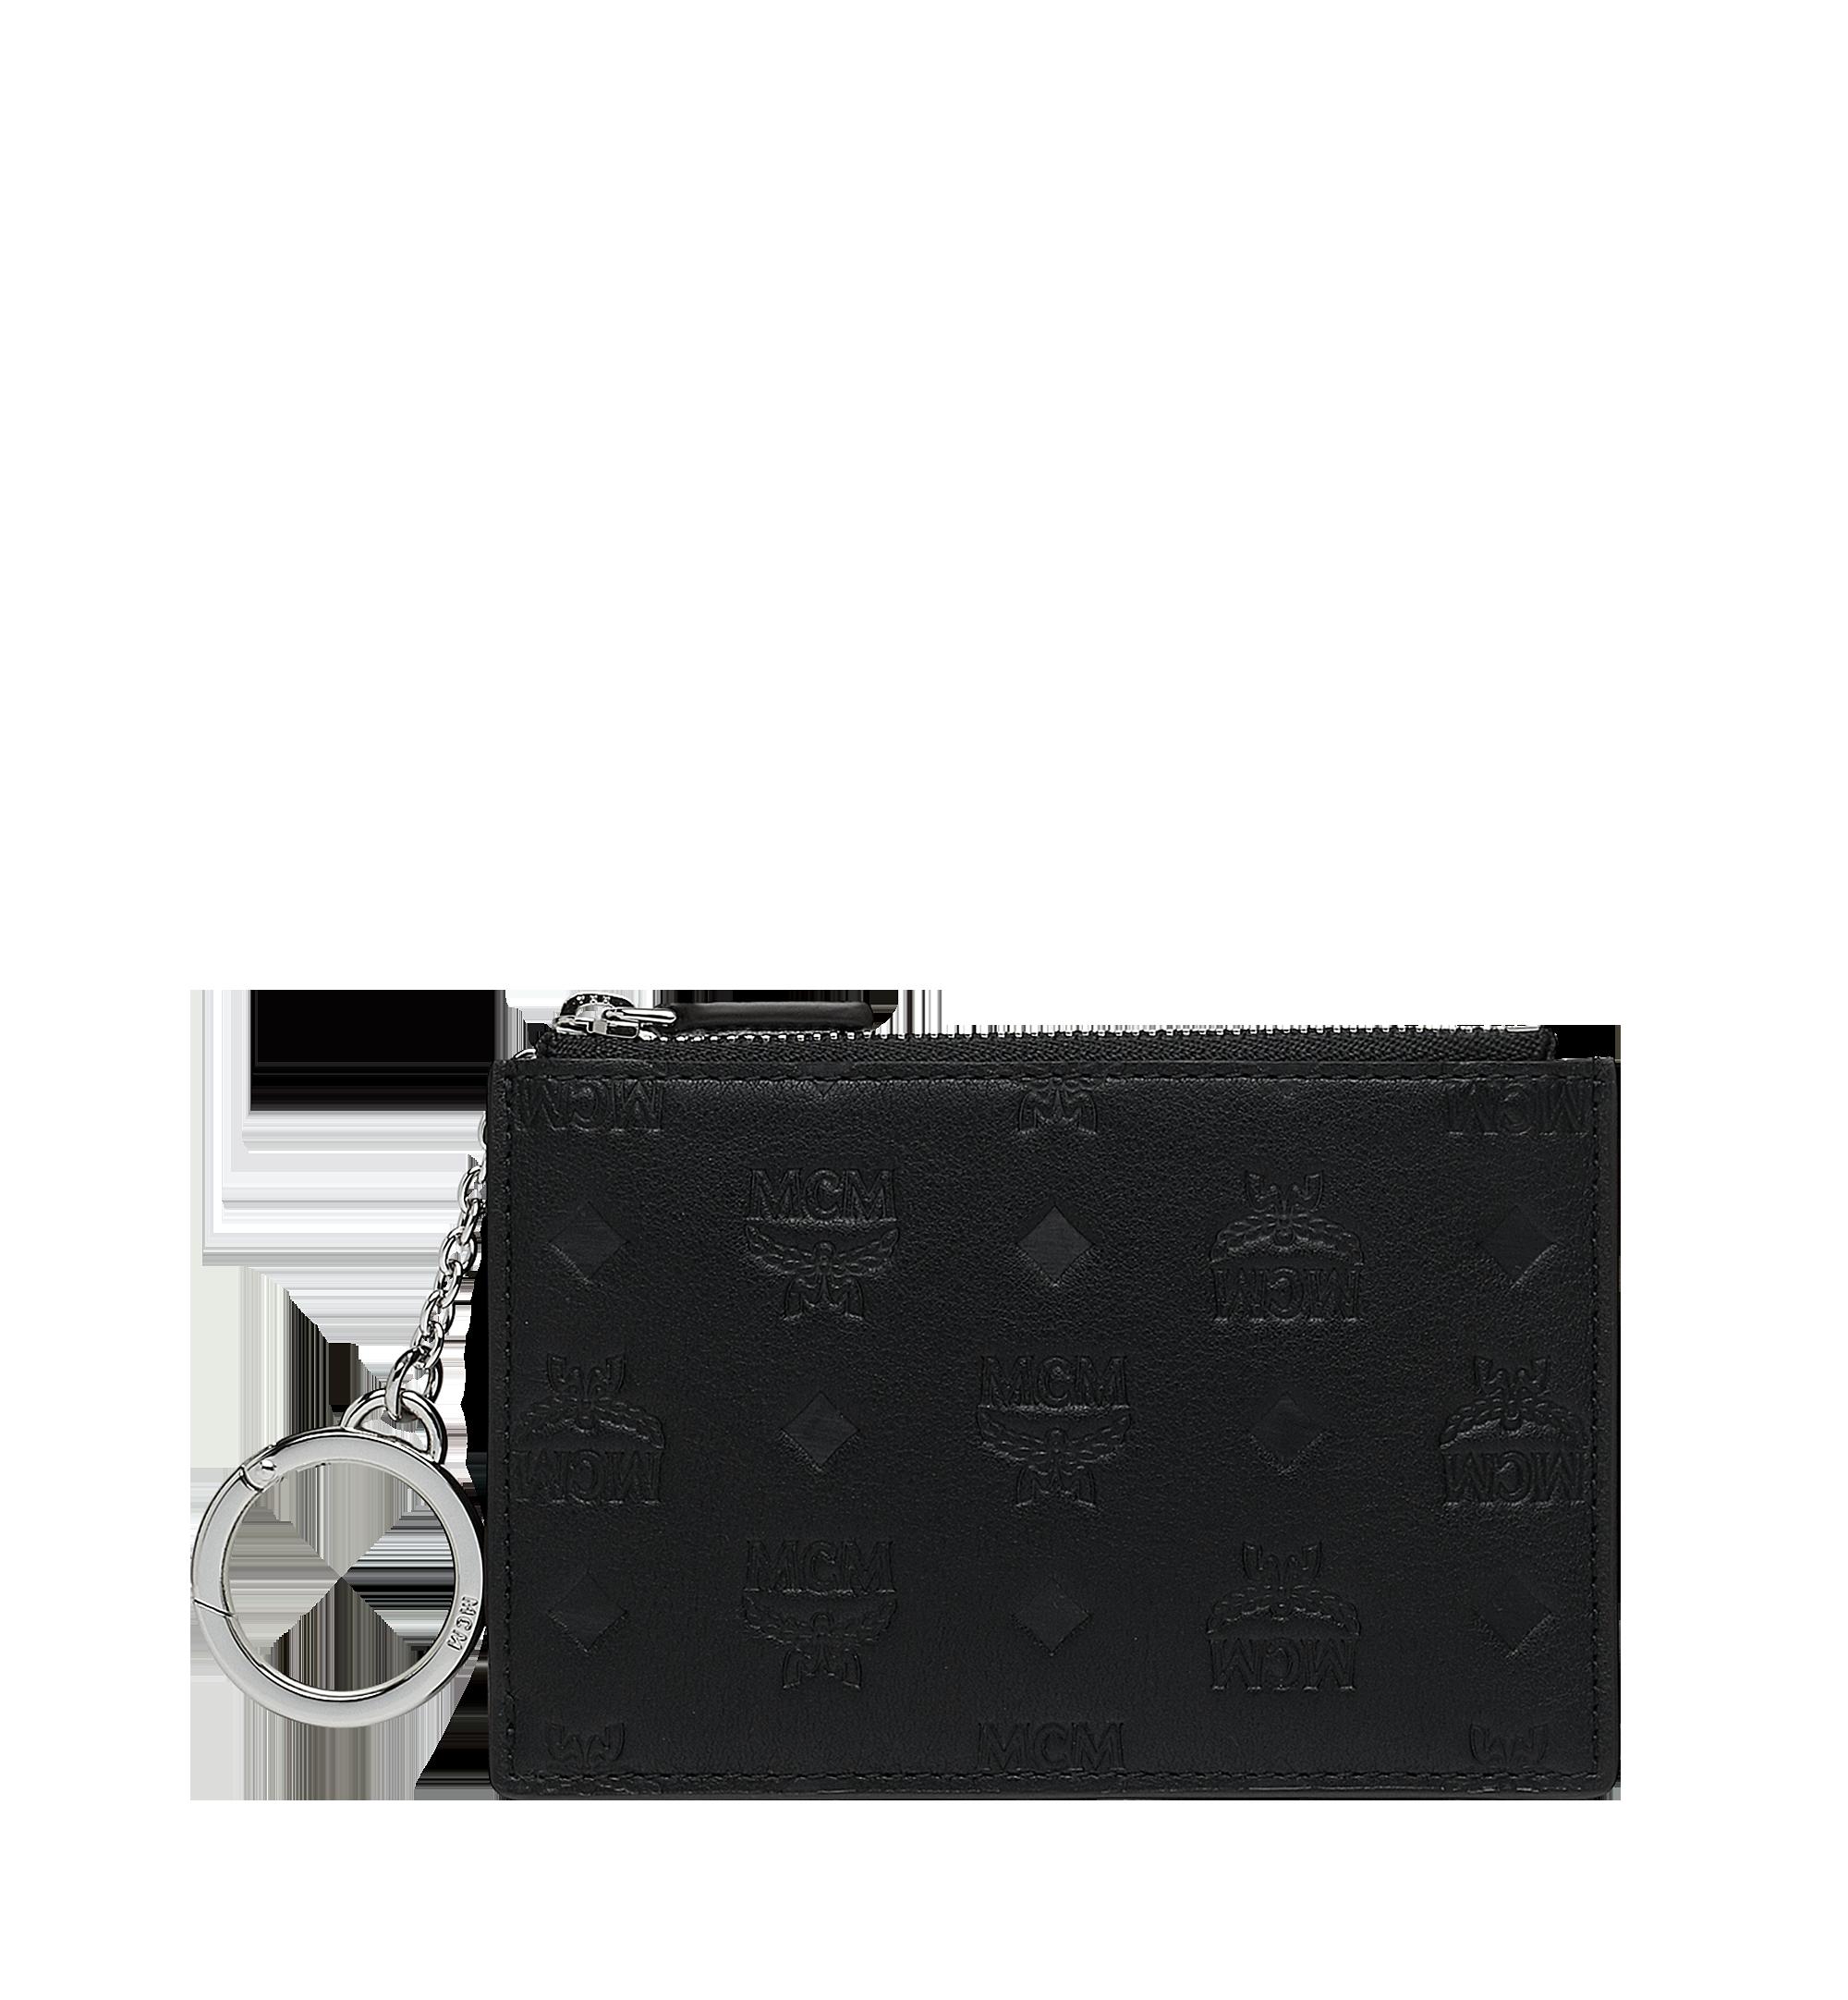 Key Pouch In Monogram Leather in Bk